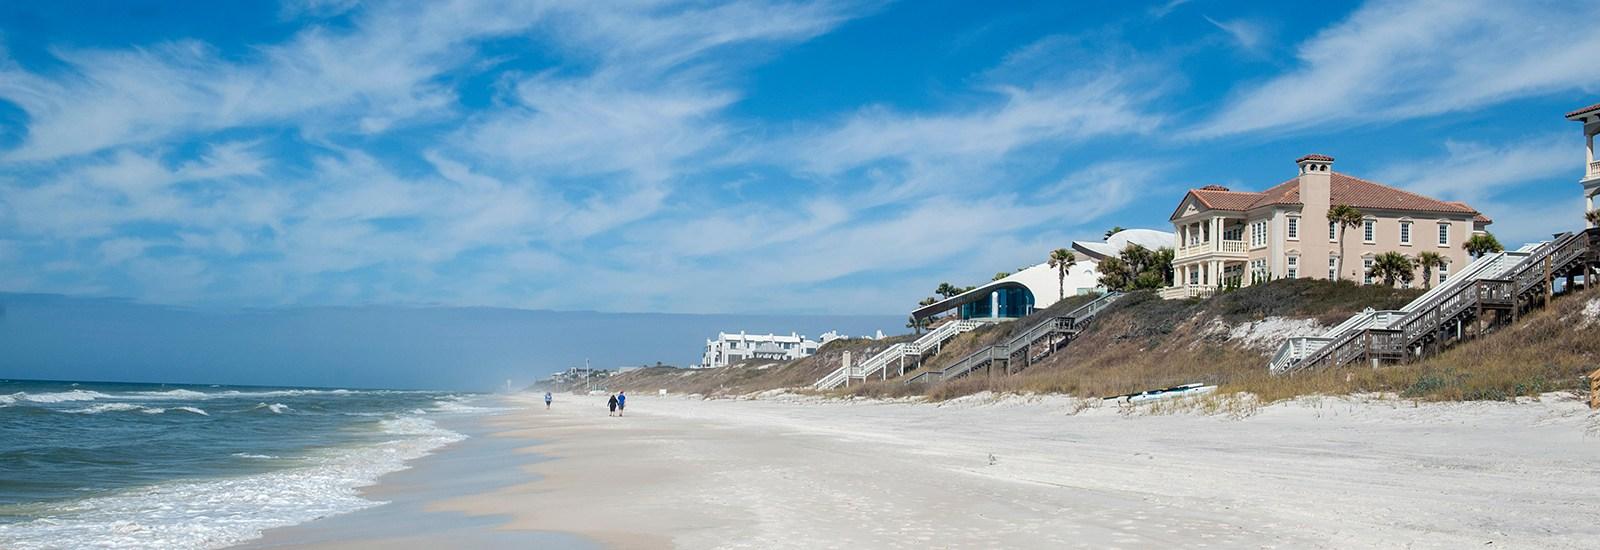 Santa Rosa Beach Florida 6 Reasons To Relocate To The Emerald Coast